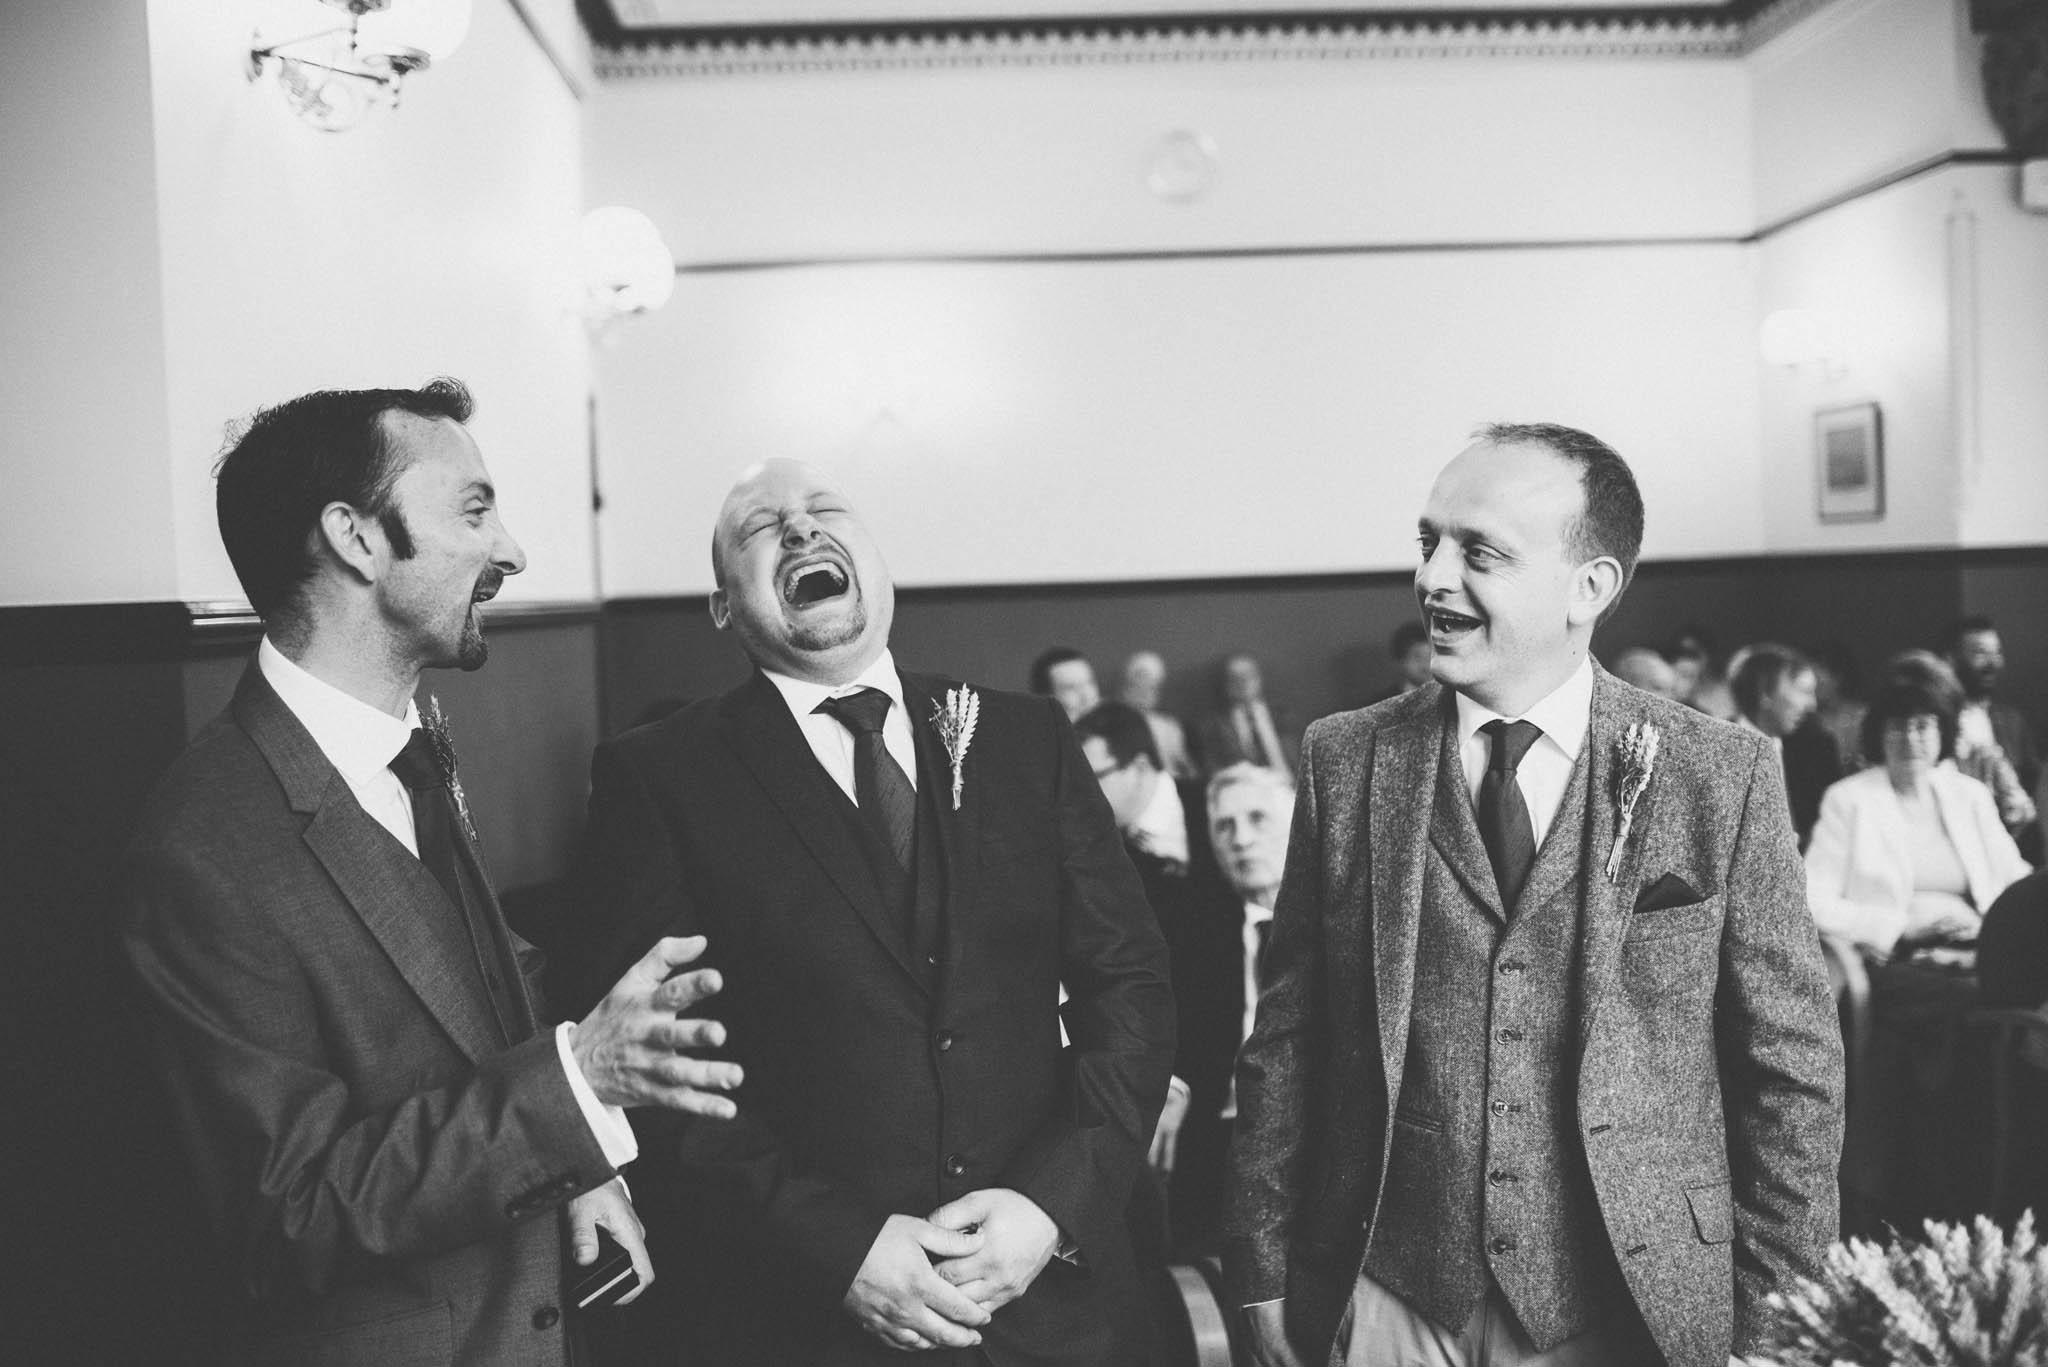 Laugh-wedding-blog-scott-stockwell-photography-end-2017.jpg